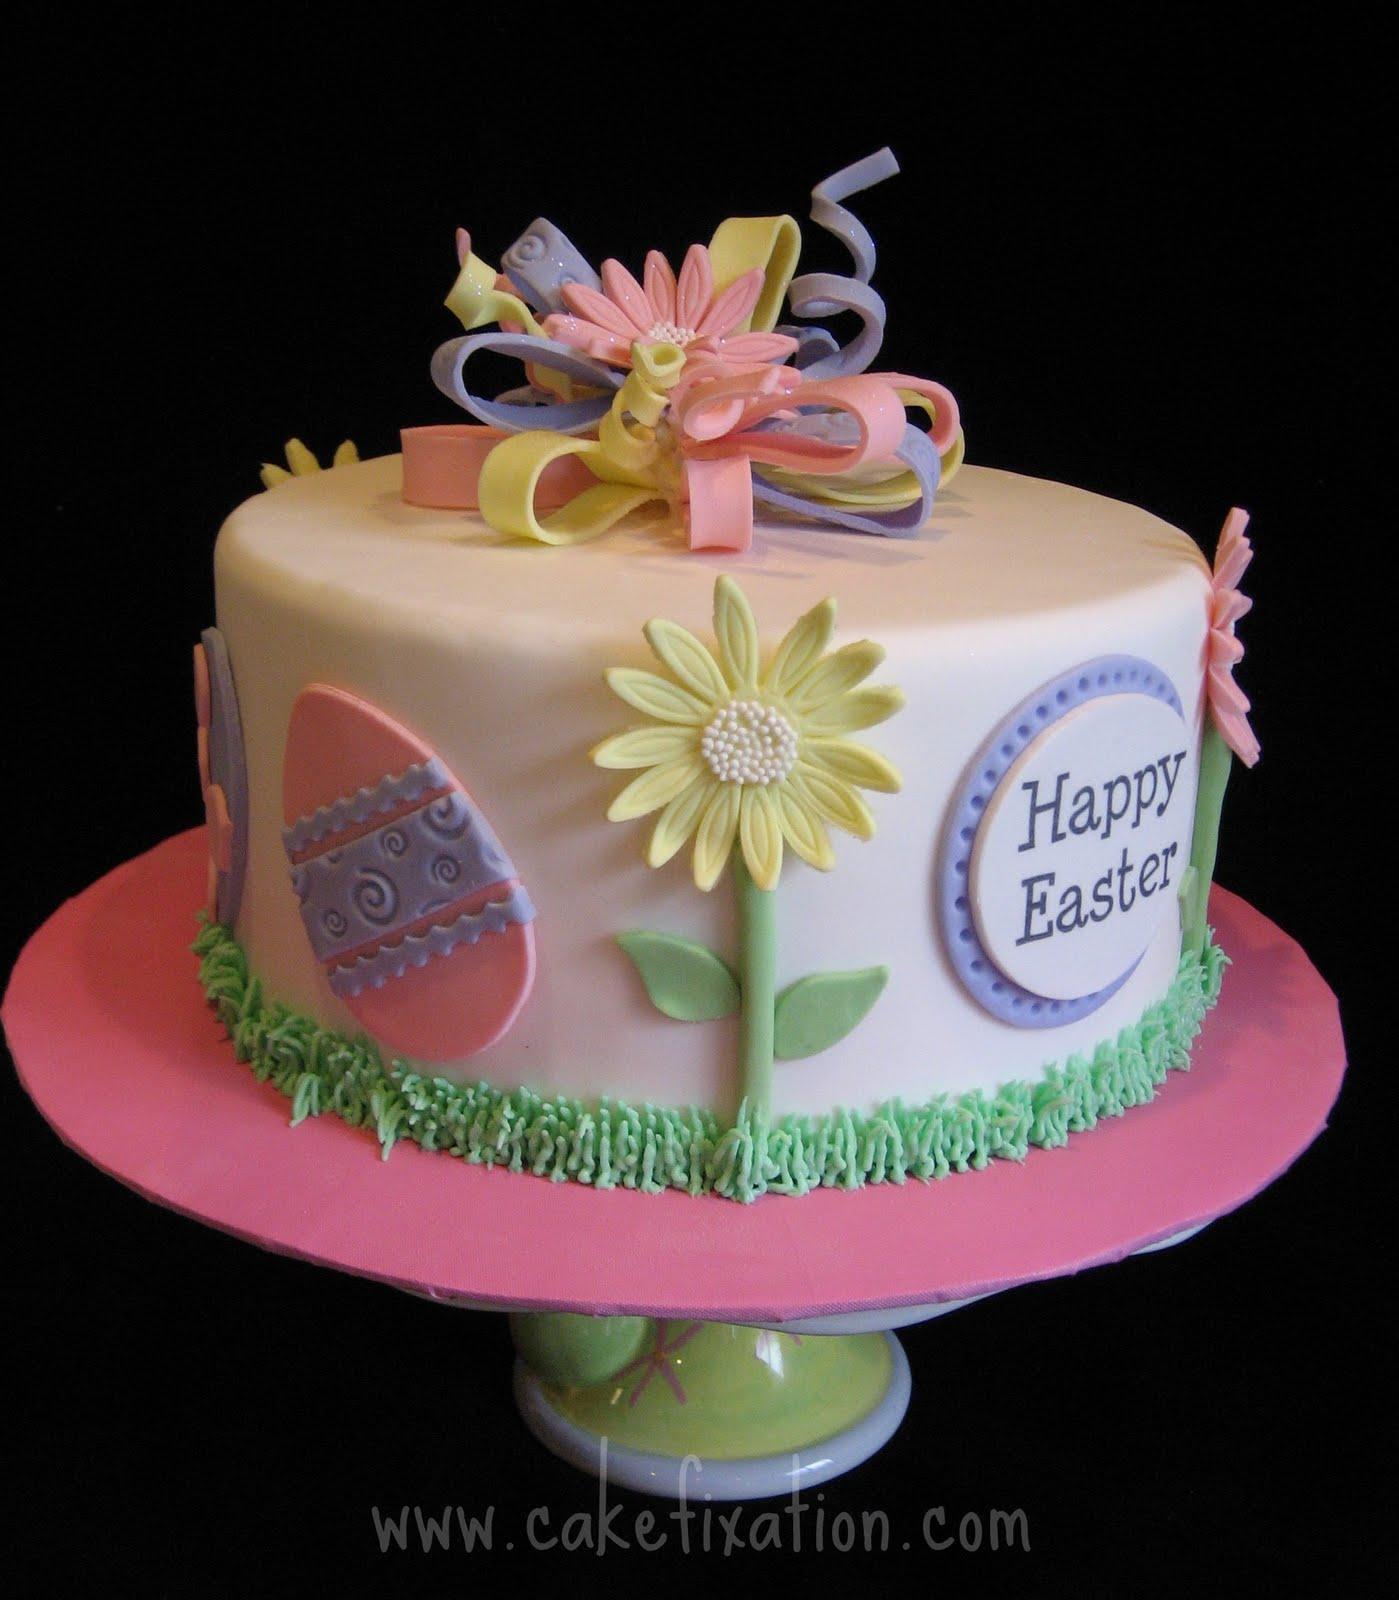 cake wrecks home sunday sweets happy easter. Black Bedroom Furniture Sets. Home Design Ideas